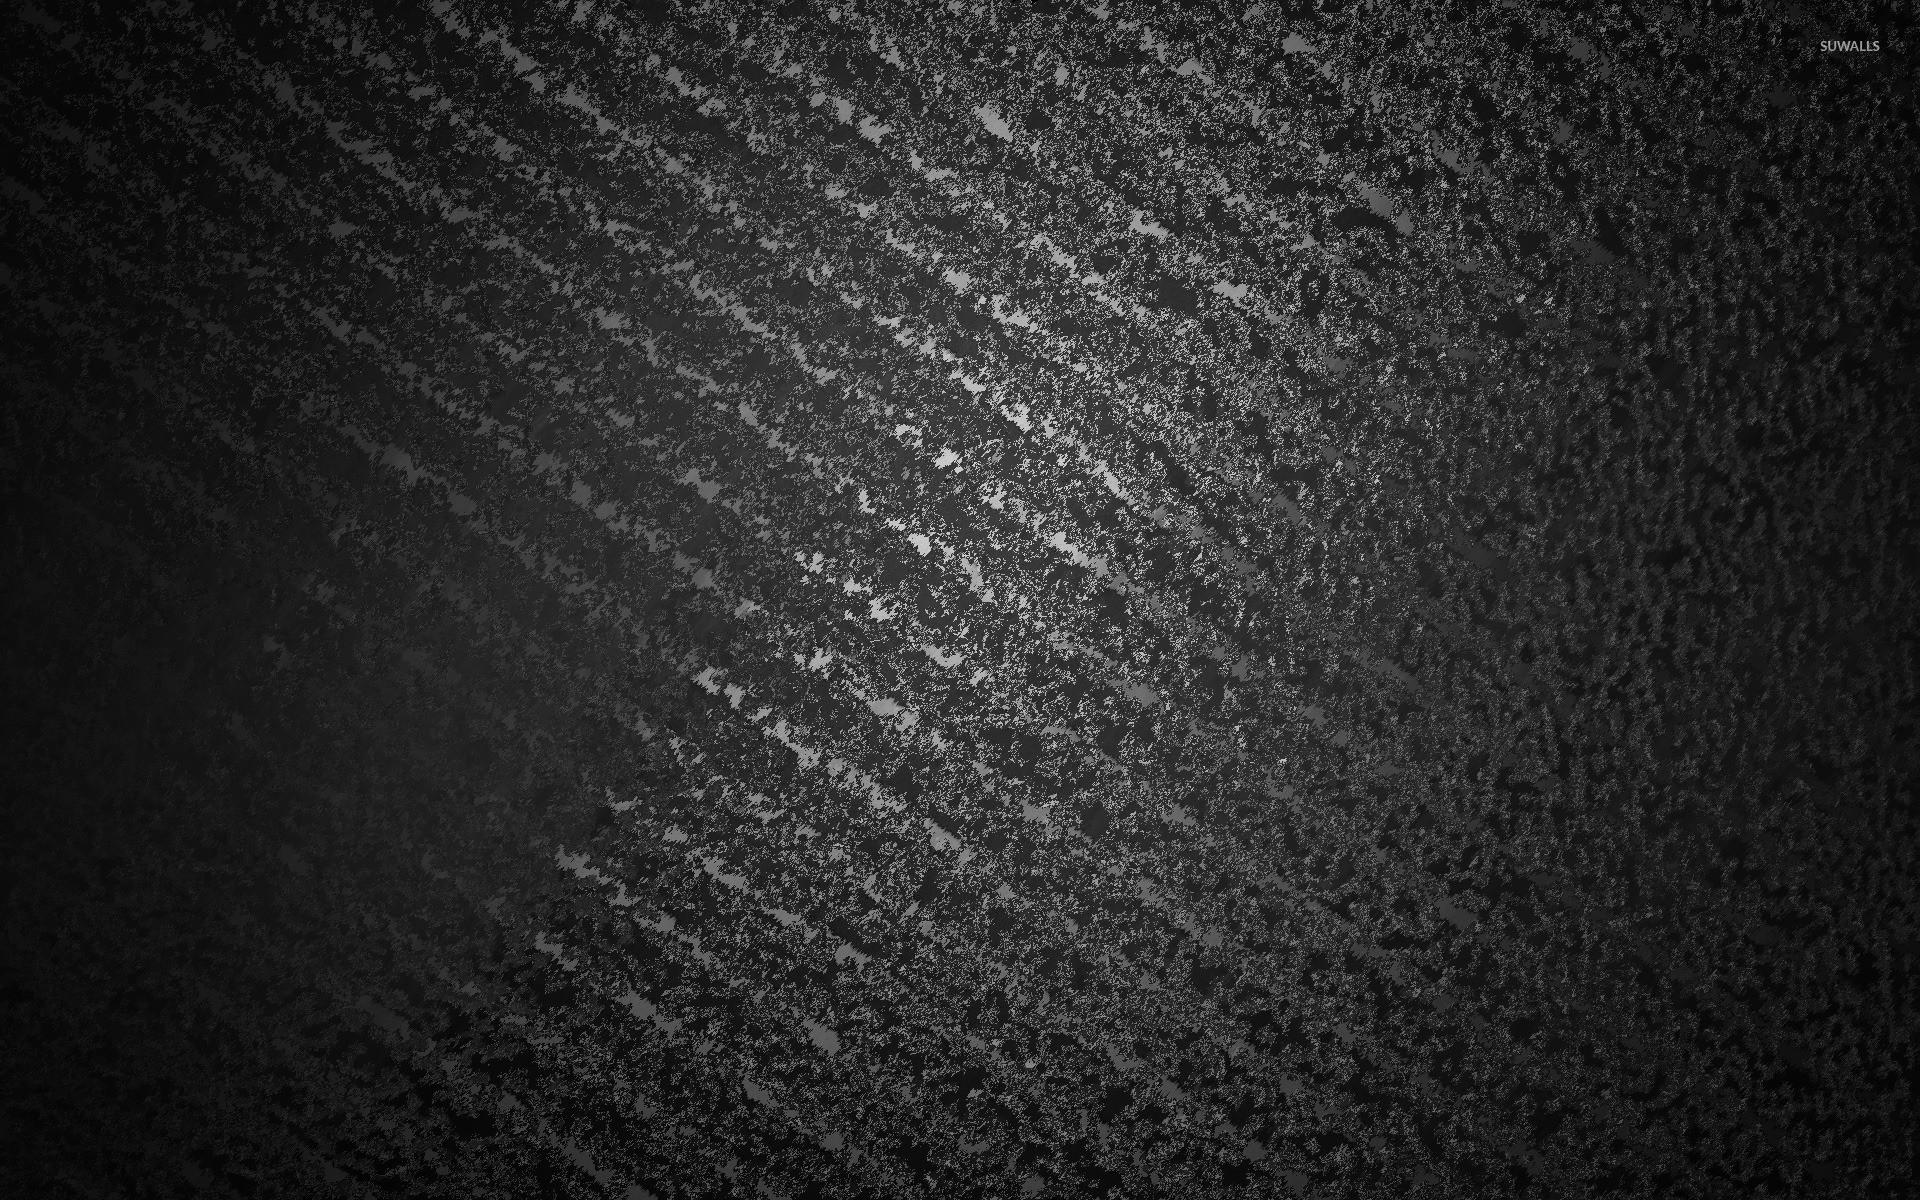 Metallic texture wallpaper jpg